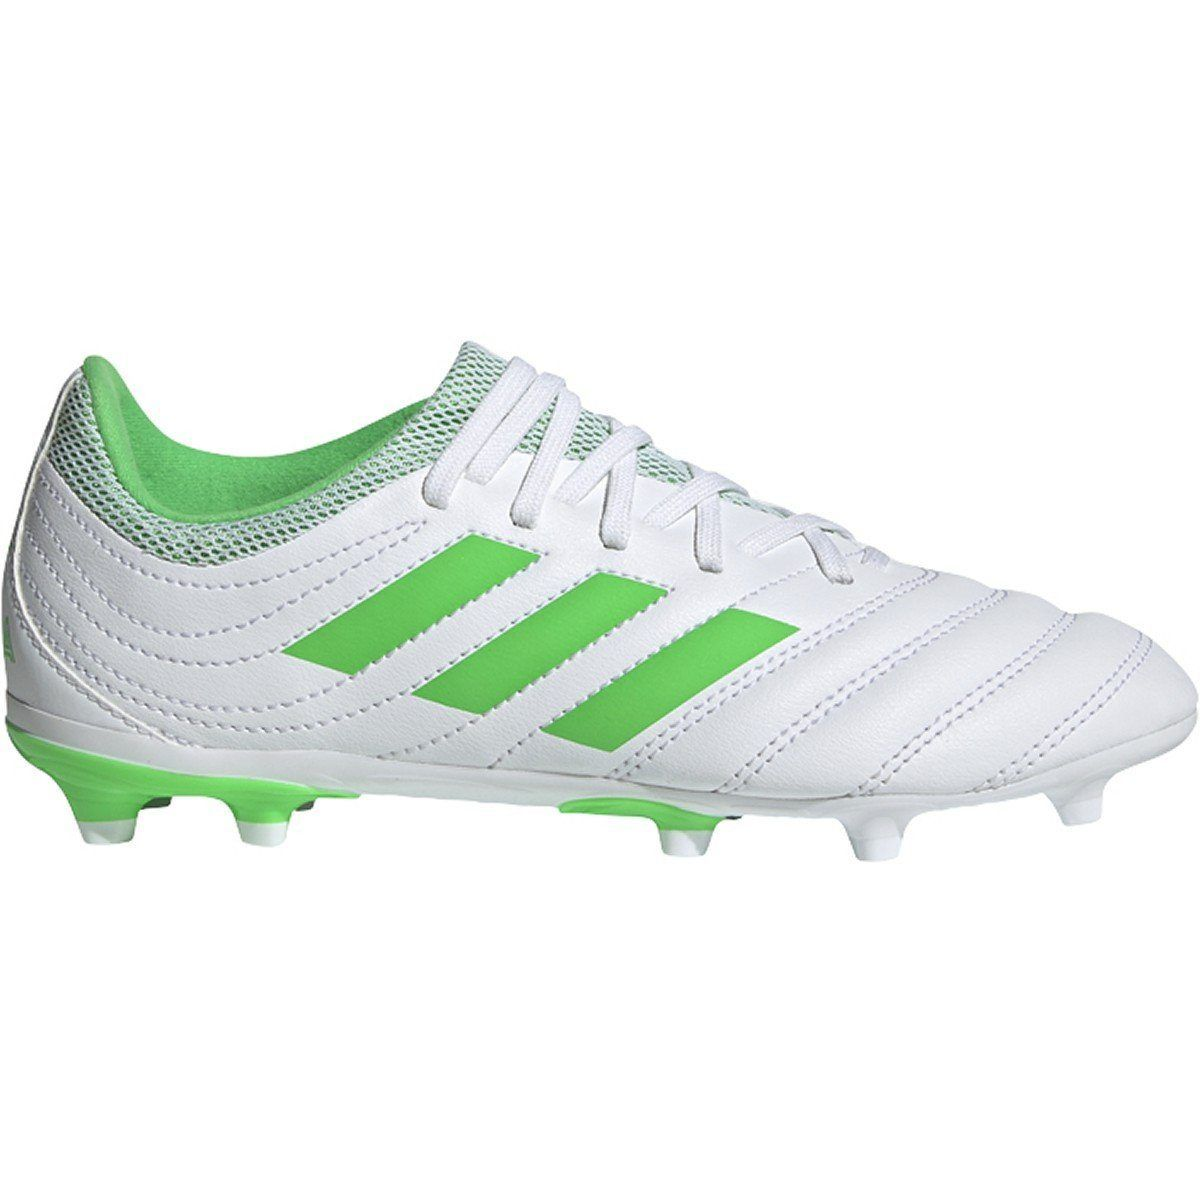 Adidas Kid S Unisex Copa 19 3 Firm Ground Soccer Shoe D98081 Soccer Cleats Adidas Adidas Soccer Shoes Adidas Kids